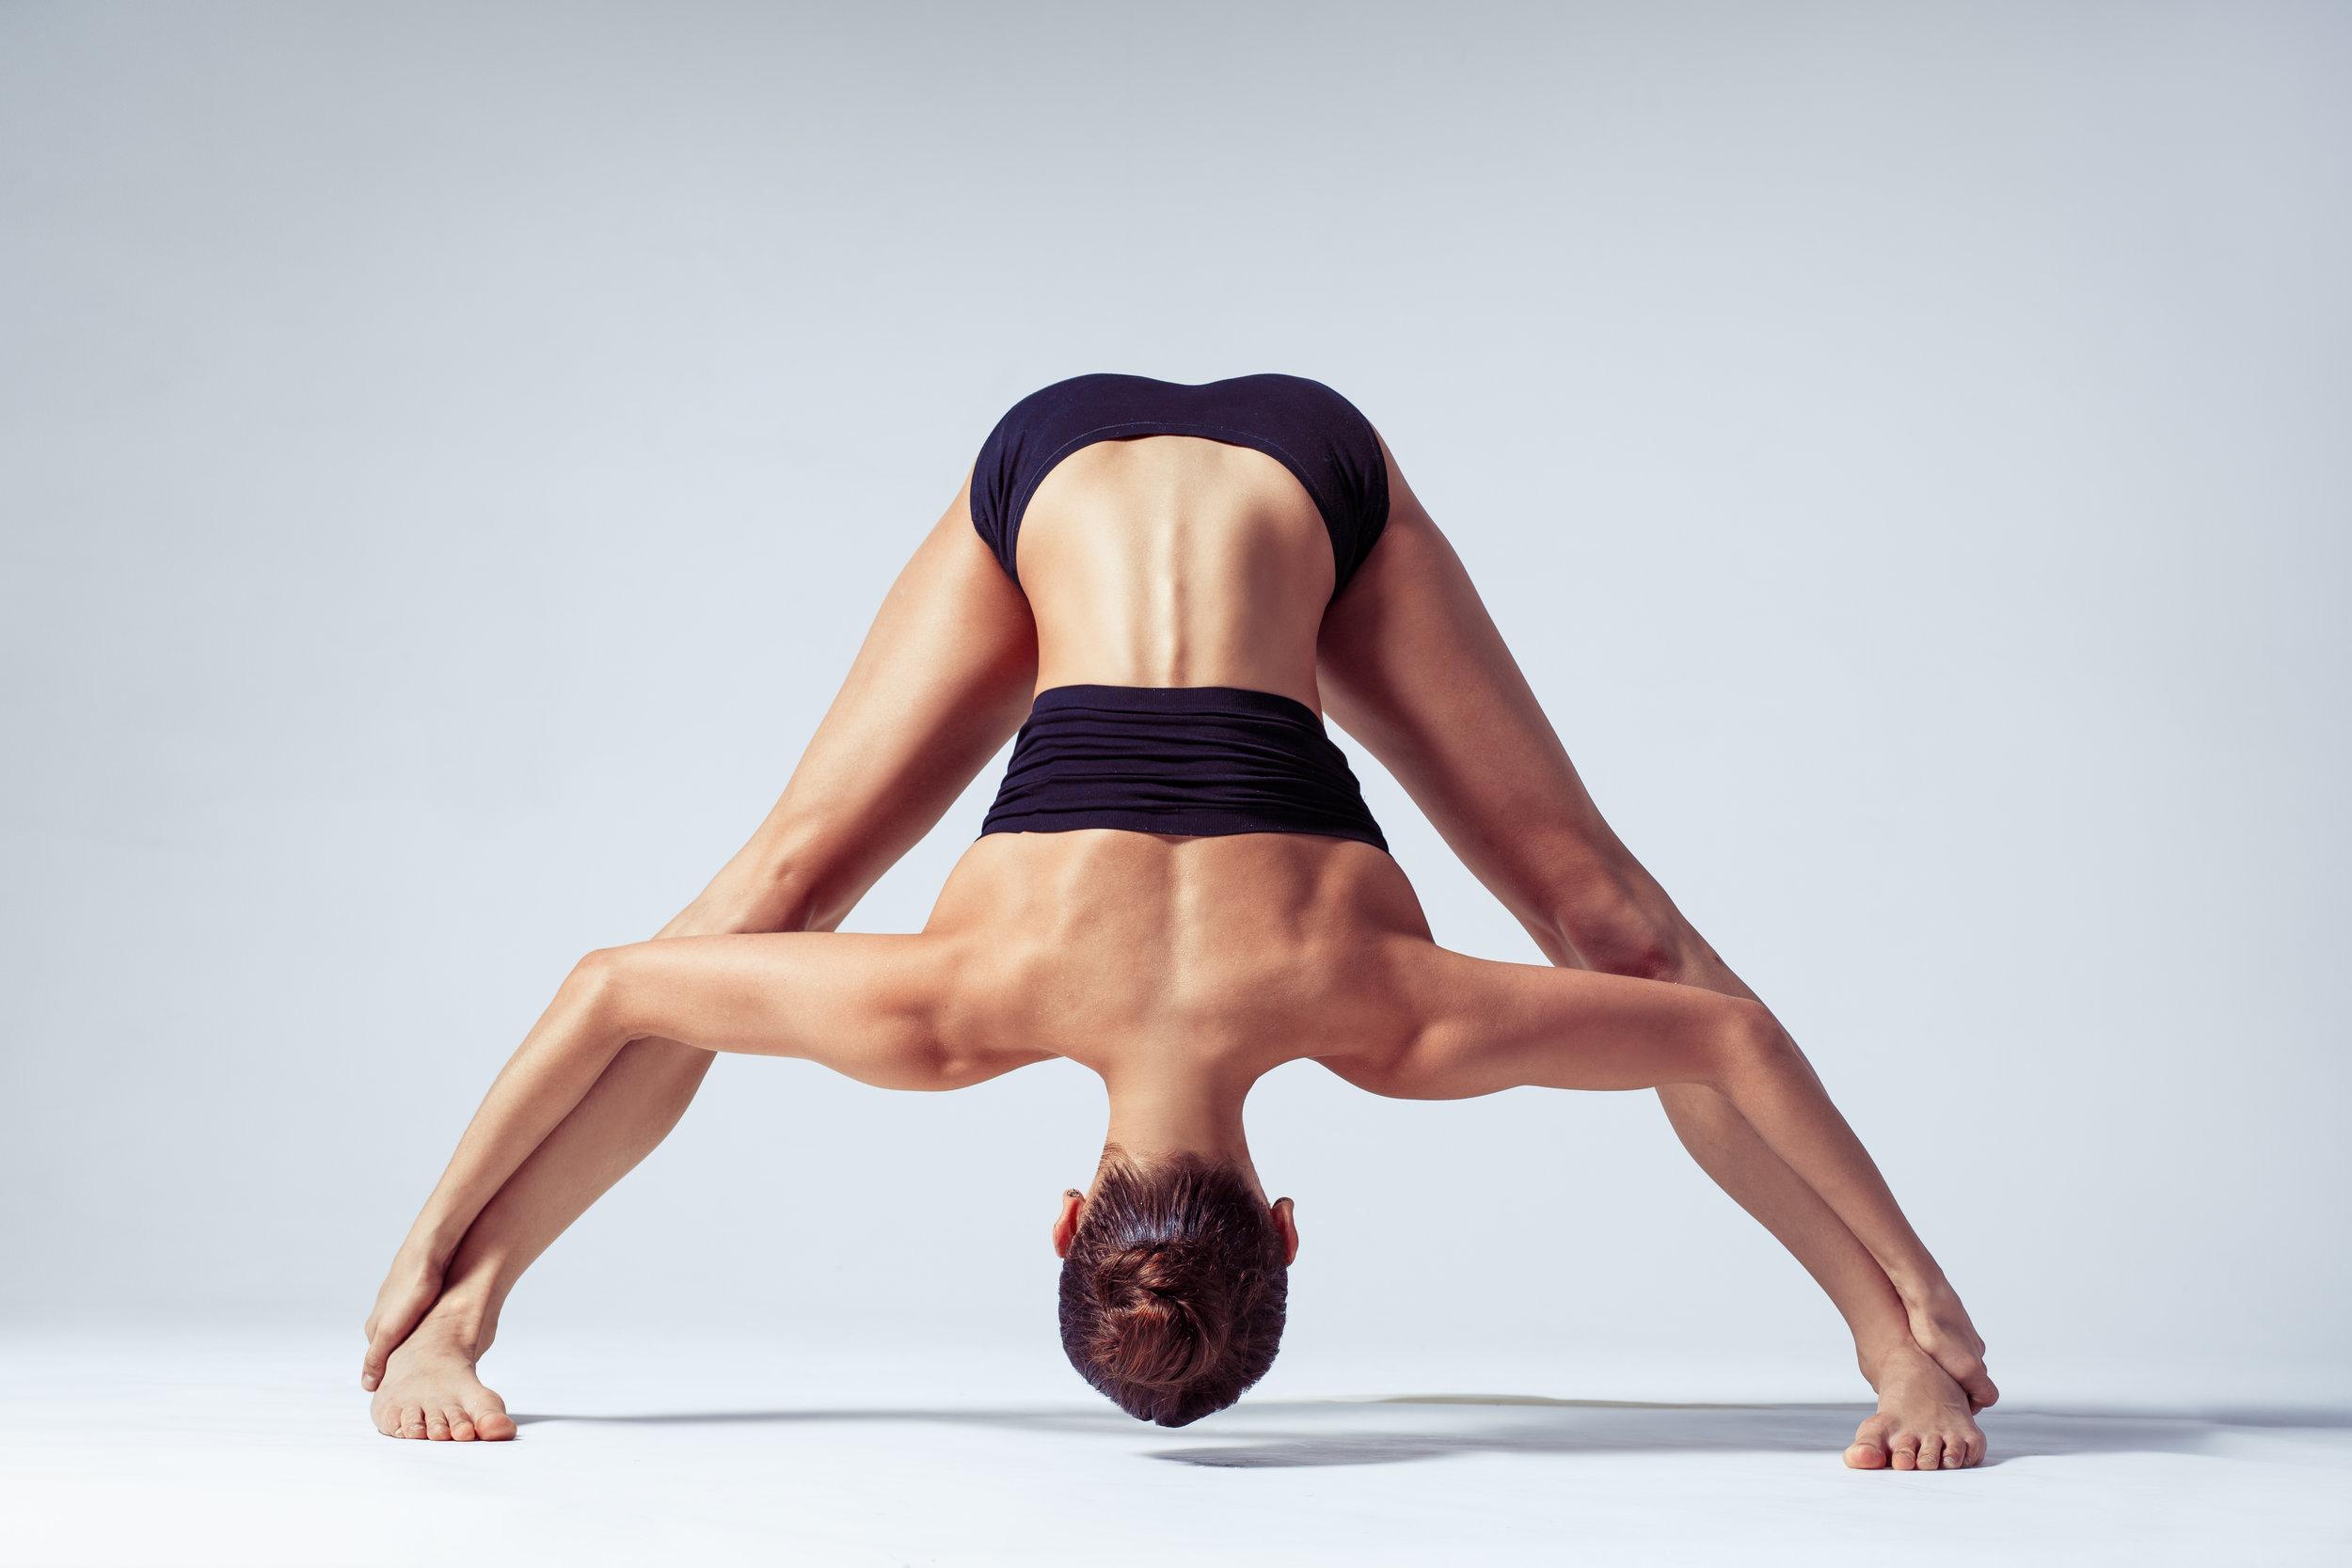 4-day-3-night-yoga-retreat-new-orleans.jpeg